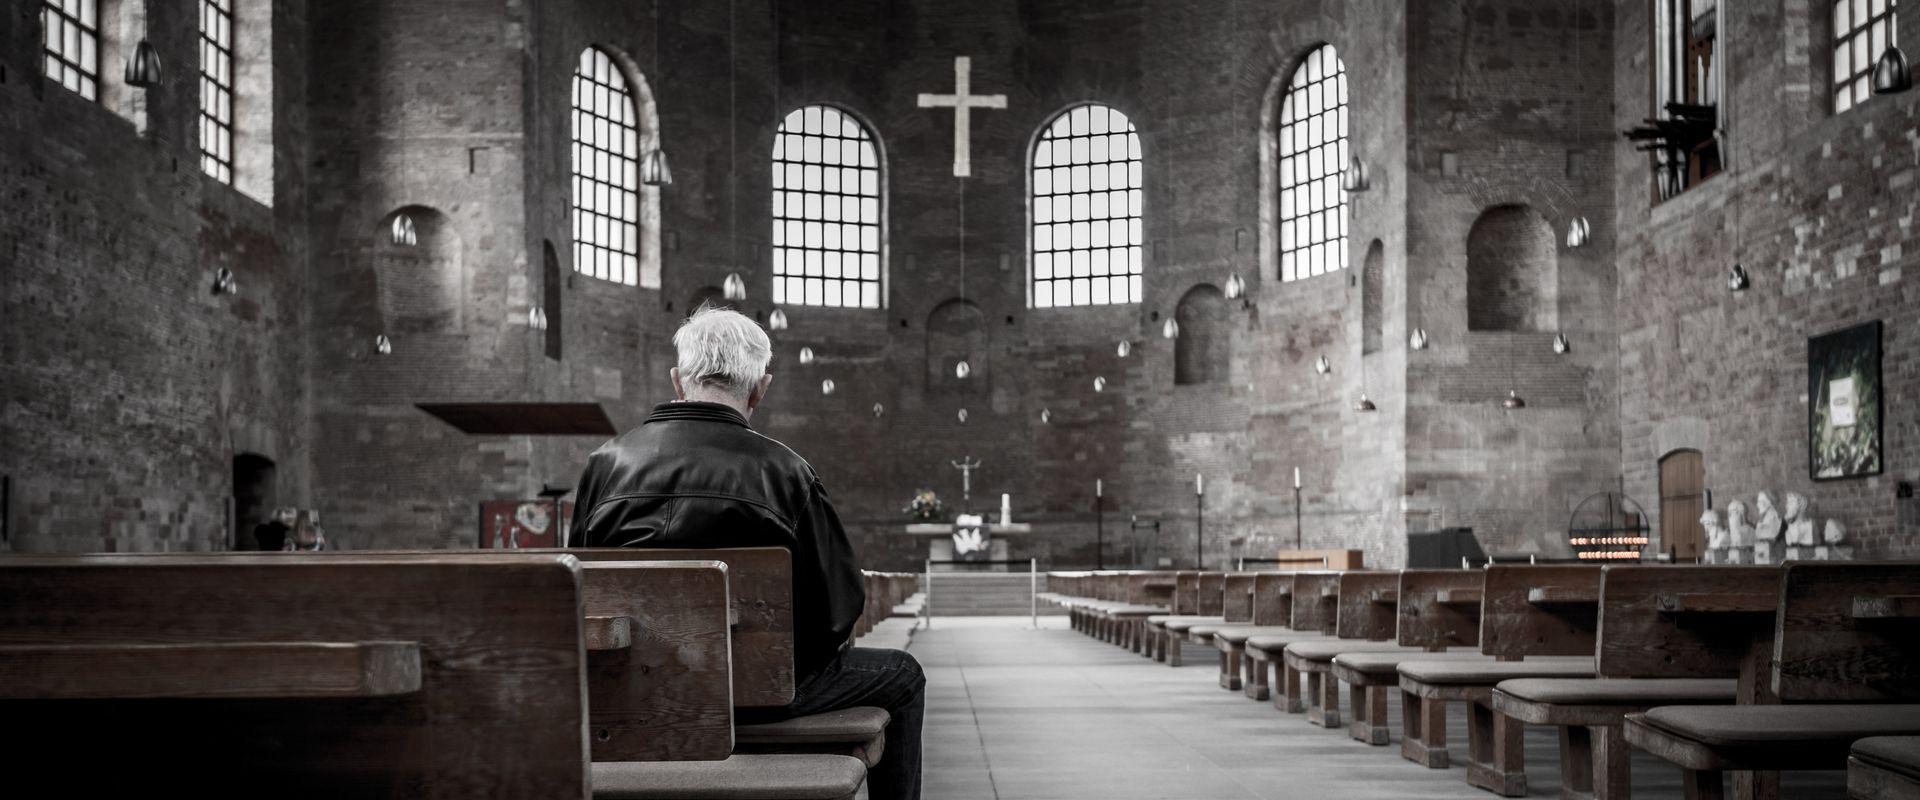 lone man in church